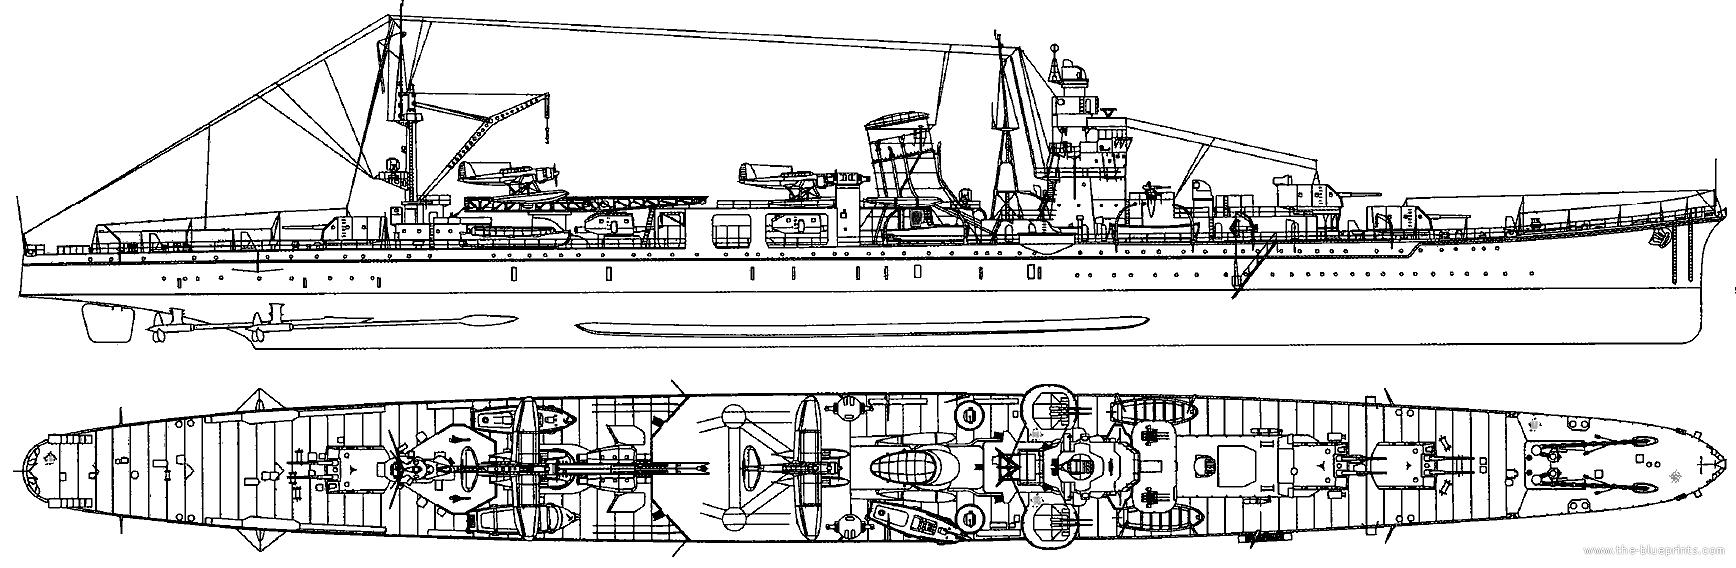 Agano Japan  city images : ... Blueprints > Ships > Cruisers Japan > IJN Agano 1943 [Light Cruiser